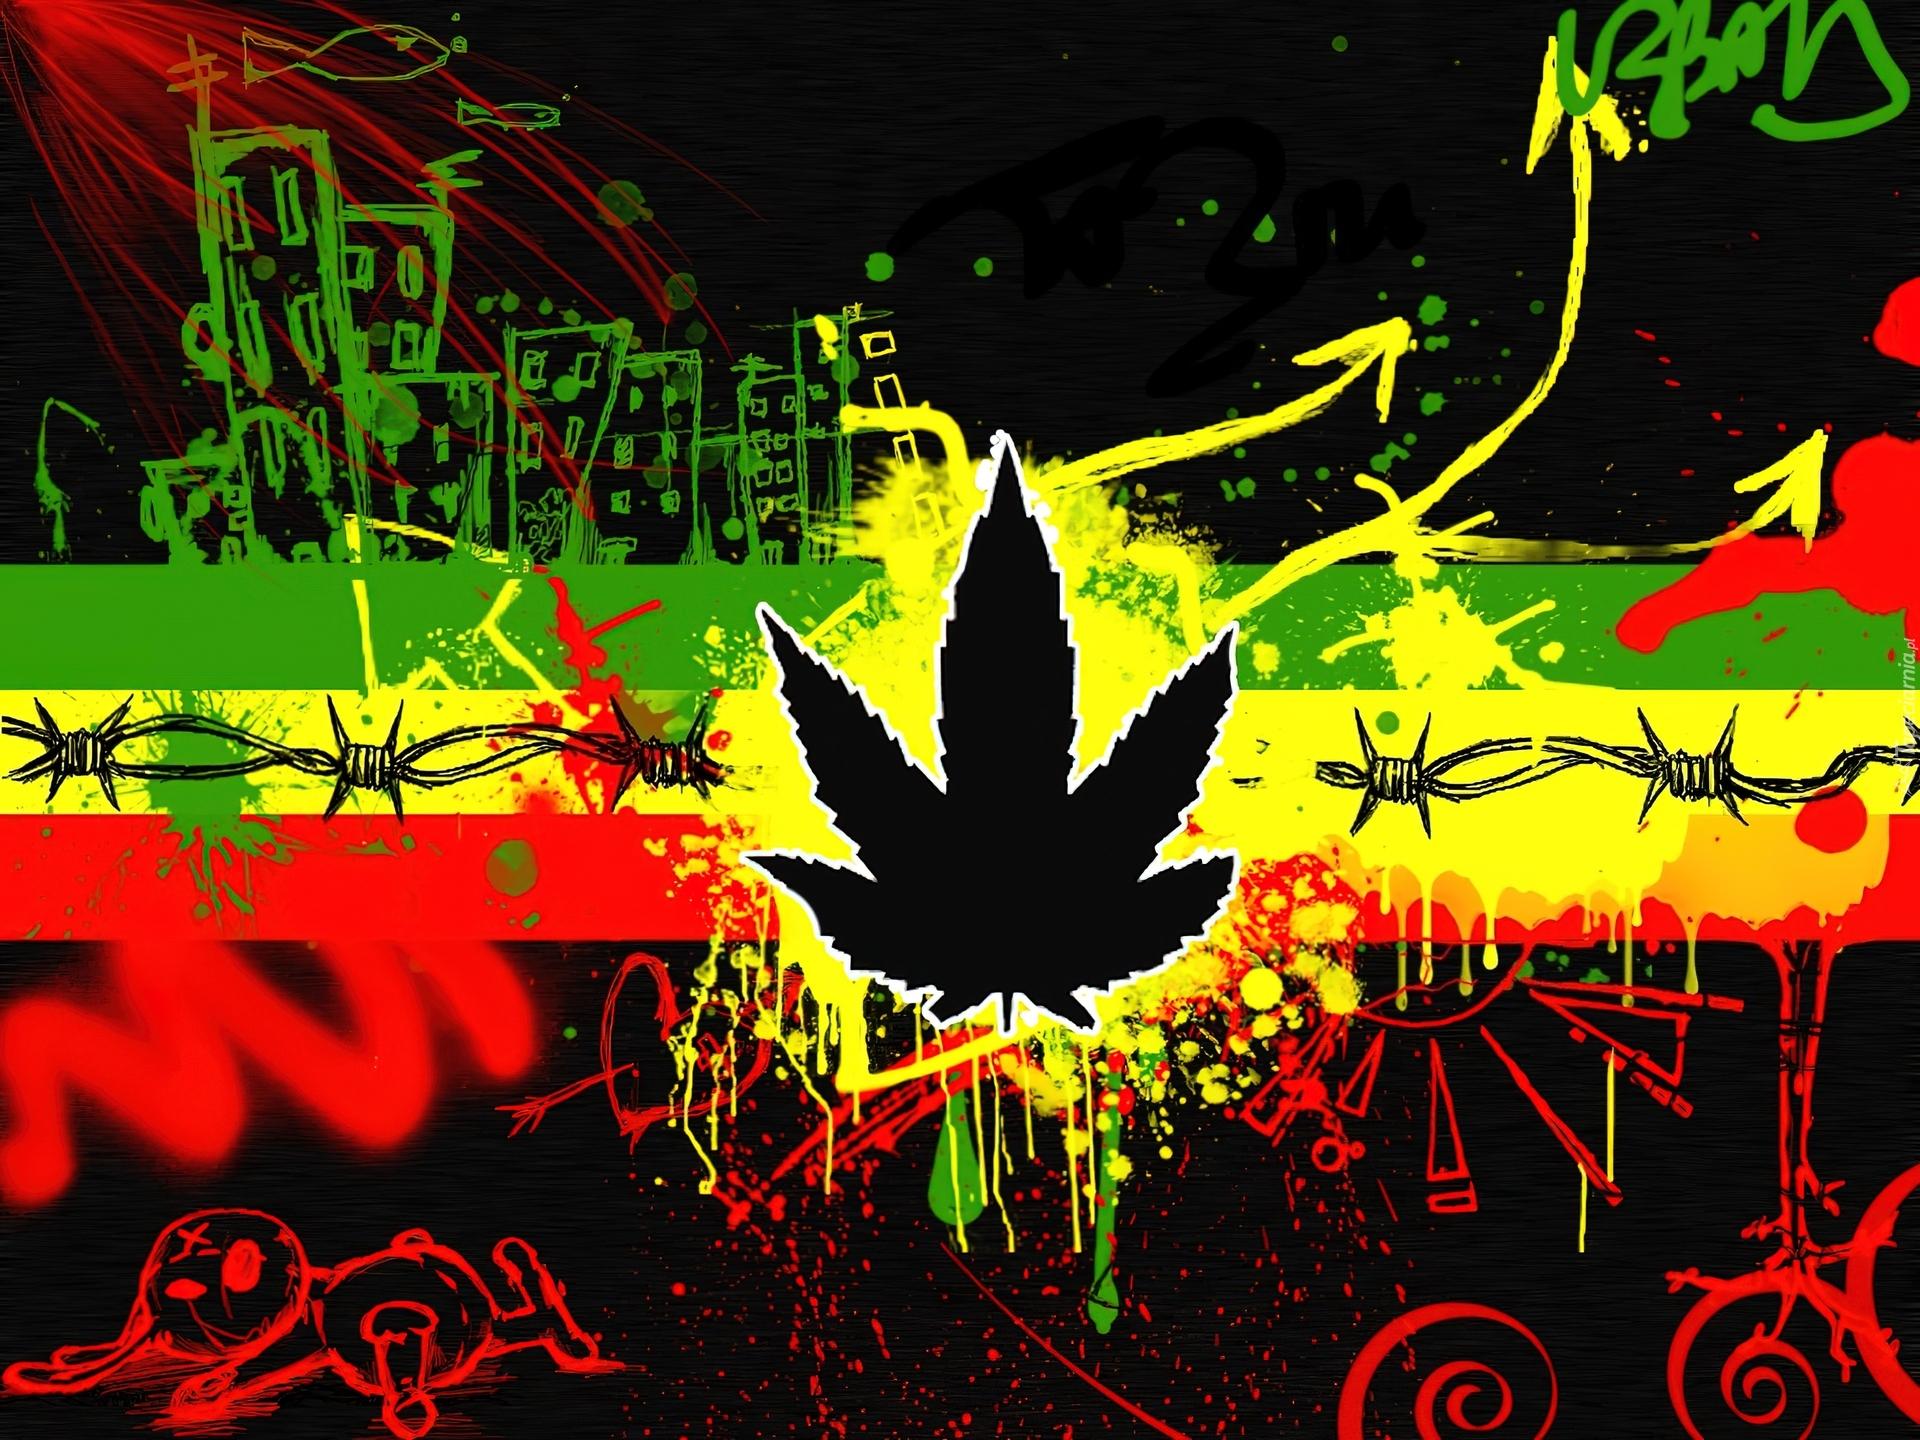 Rasta, Reggae, Grafitti